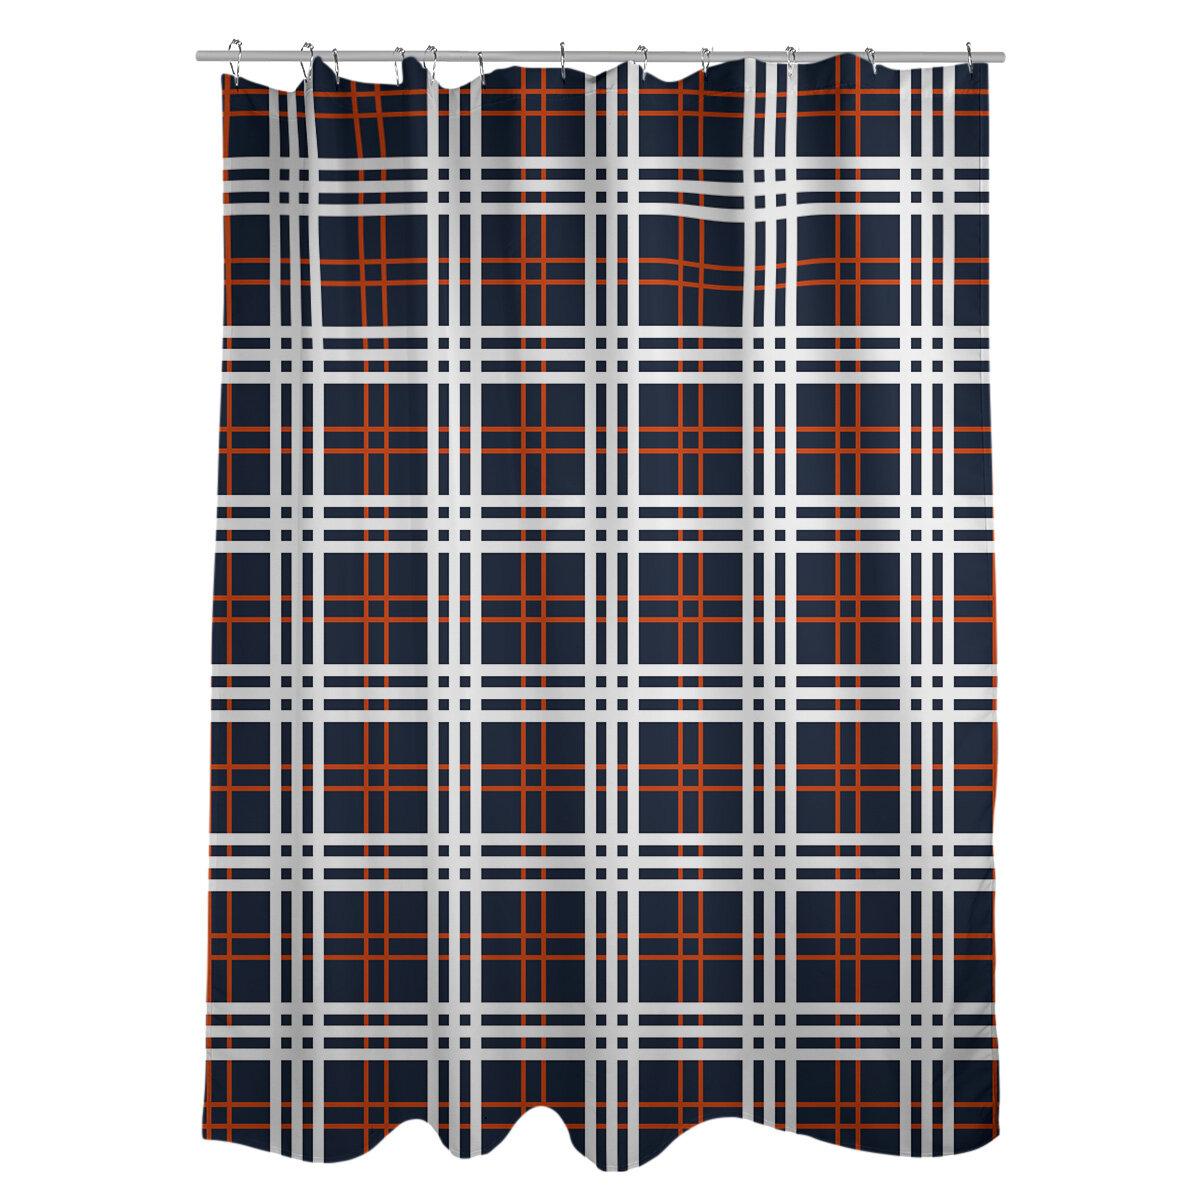 LEMOISTARS Football Team Shower Curtain for Bathroom with 12 Hooks Polyester Fabric Machine Washable Waterproof Shower Curtains 72 x 72 Inch